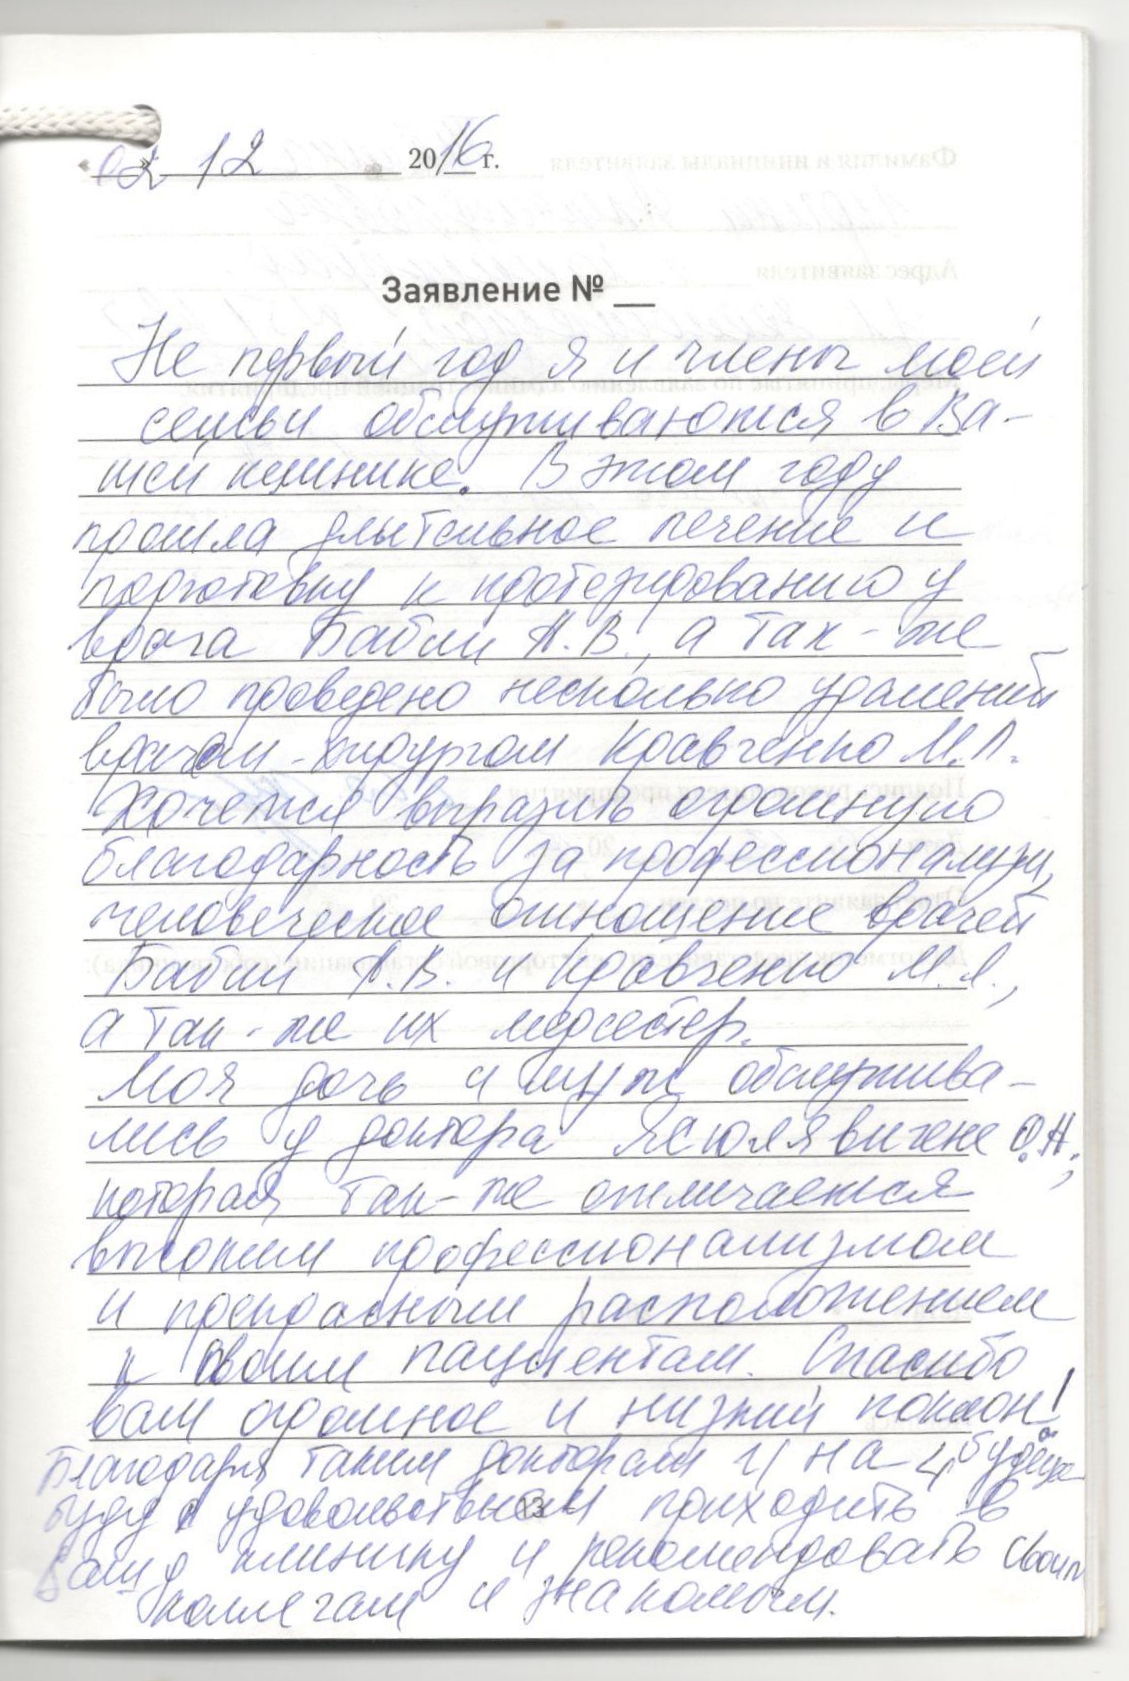 babijyasyul-kravchenko